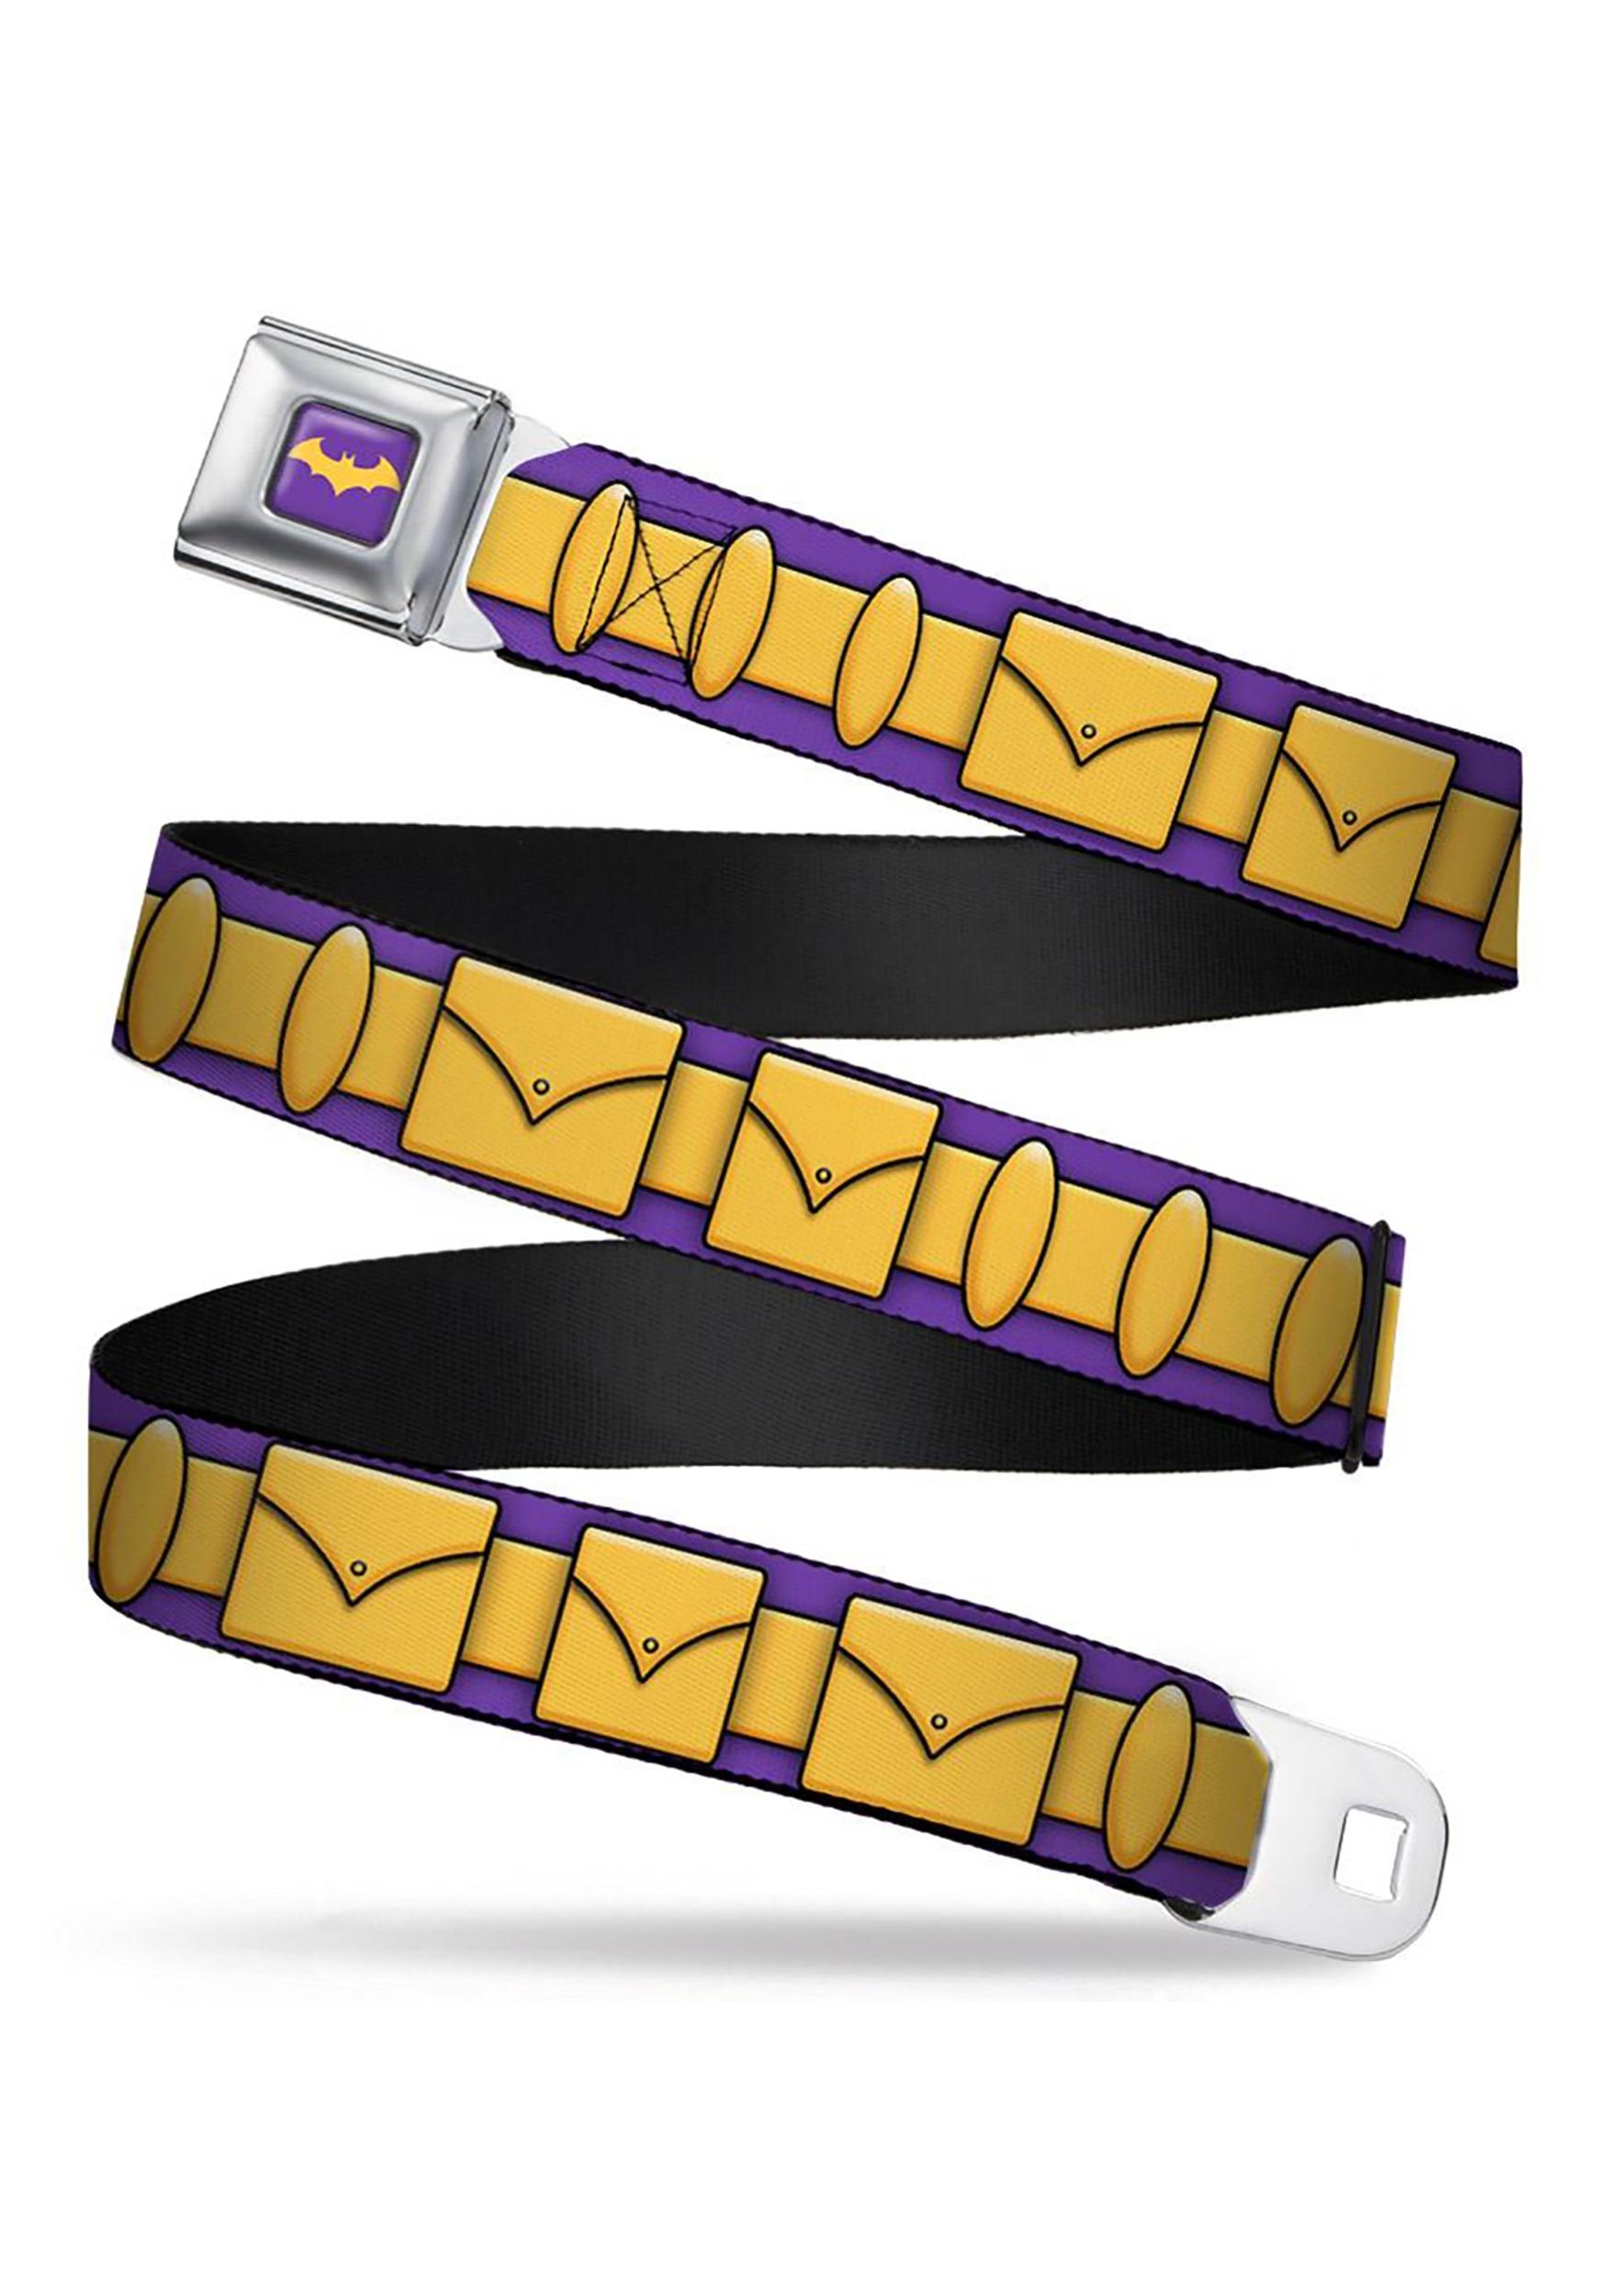 PurpleGold_Batgirl_Utility_Belt_Seatbelt_Buckle_Belt